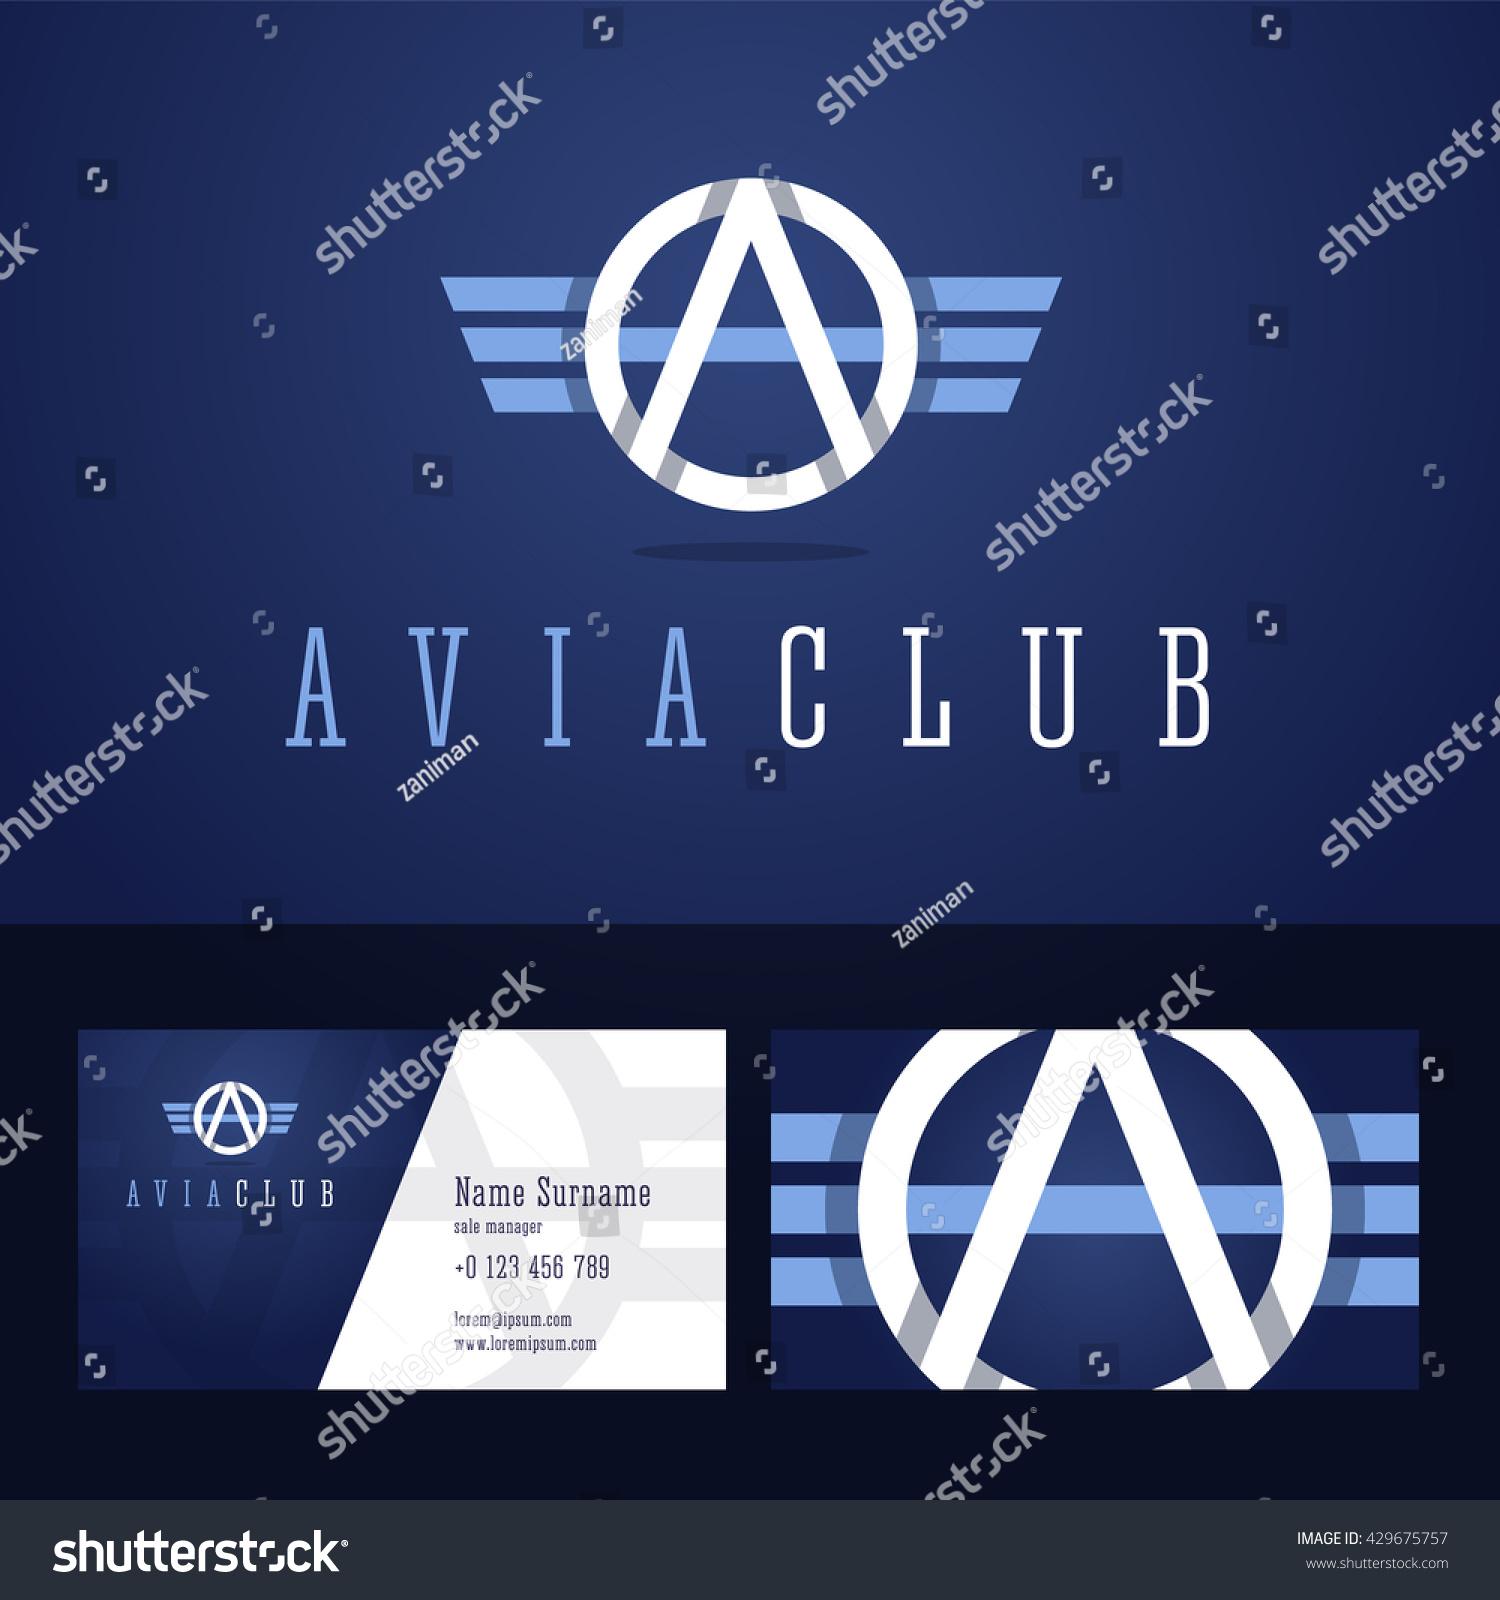 avia club logo business card template stock vector